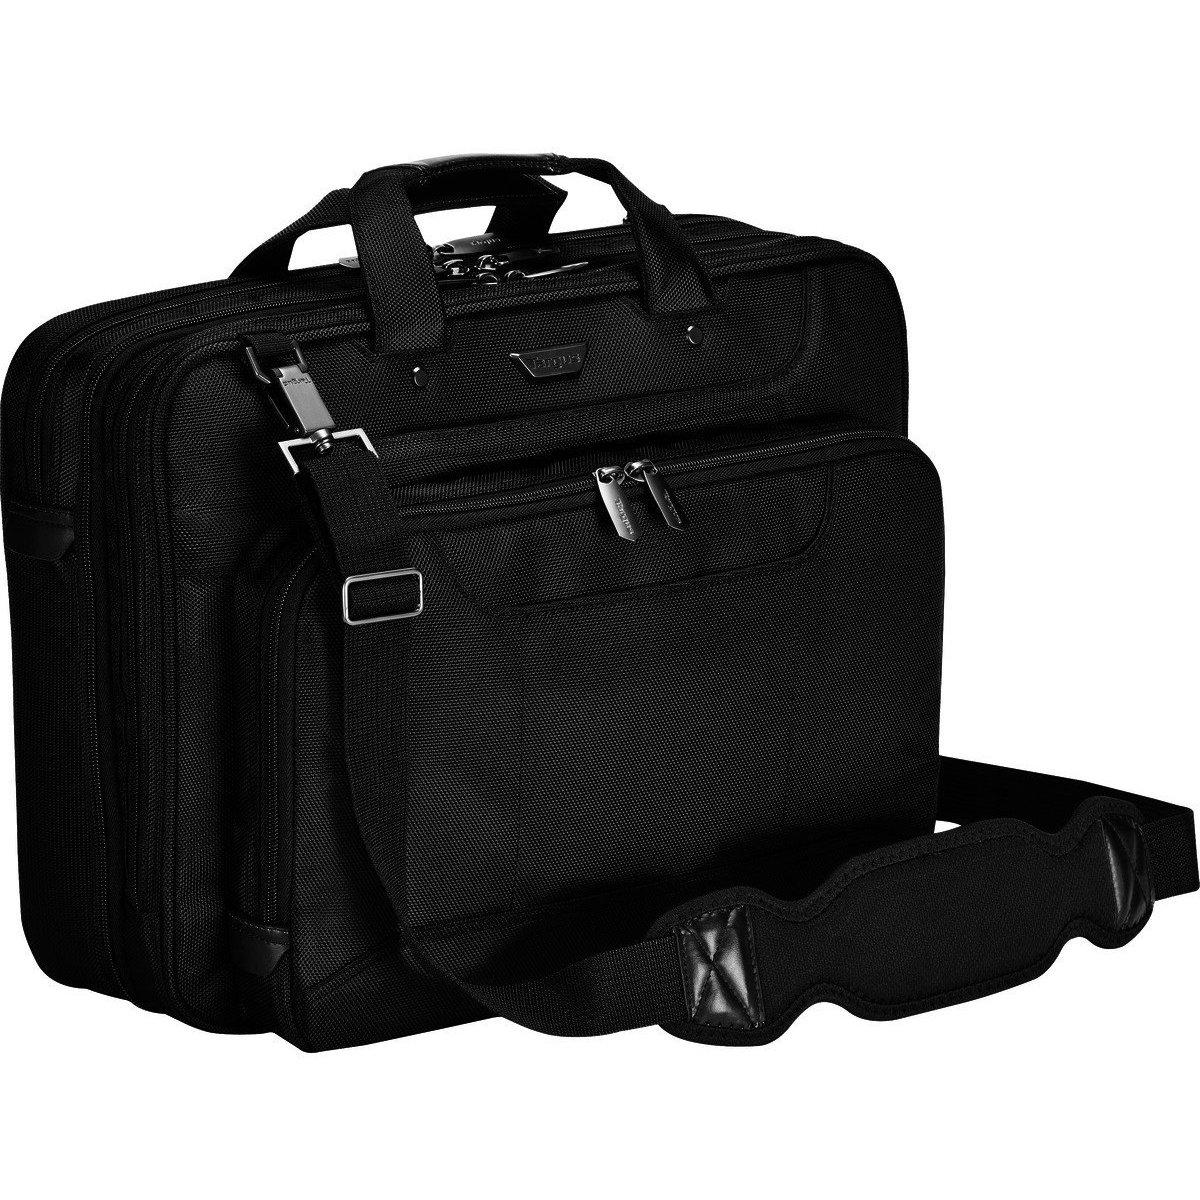 Targus Corporate Traveler Checkpoint-Friendly Laptop Bag for 16-Inch Laptops, Black (CUCT02UA15S)